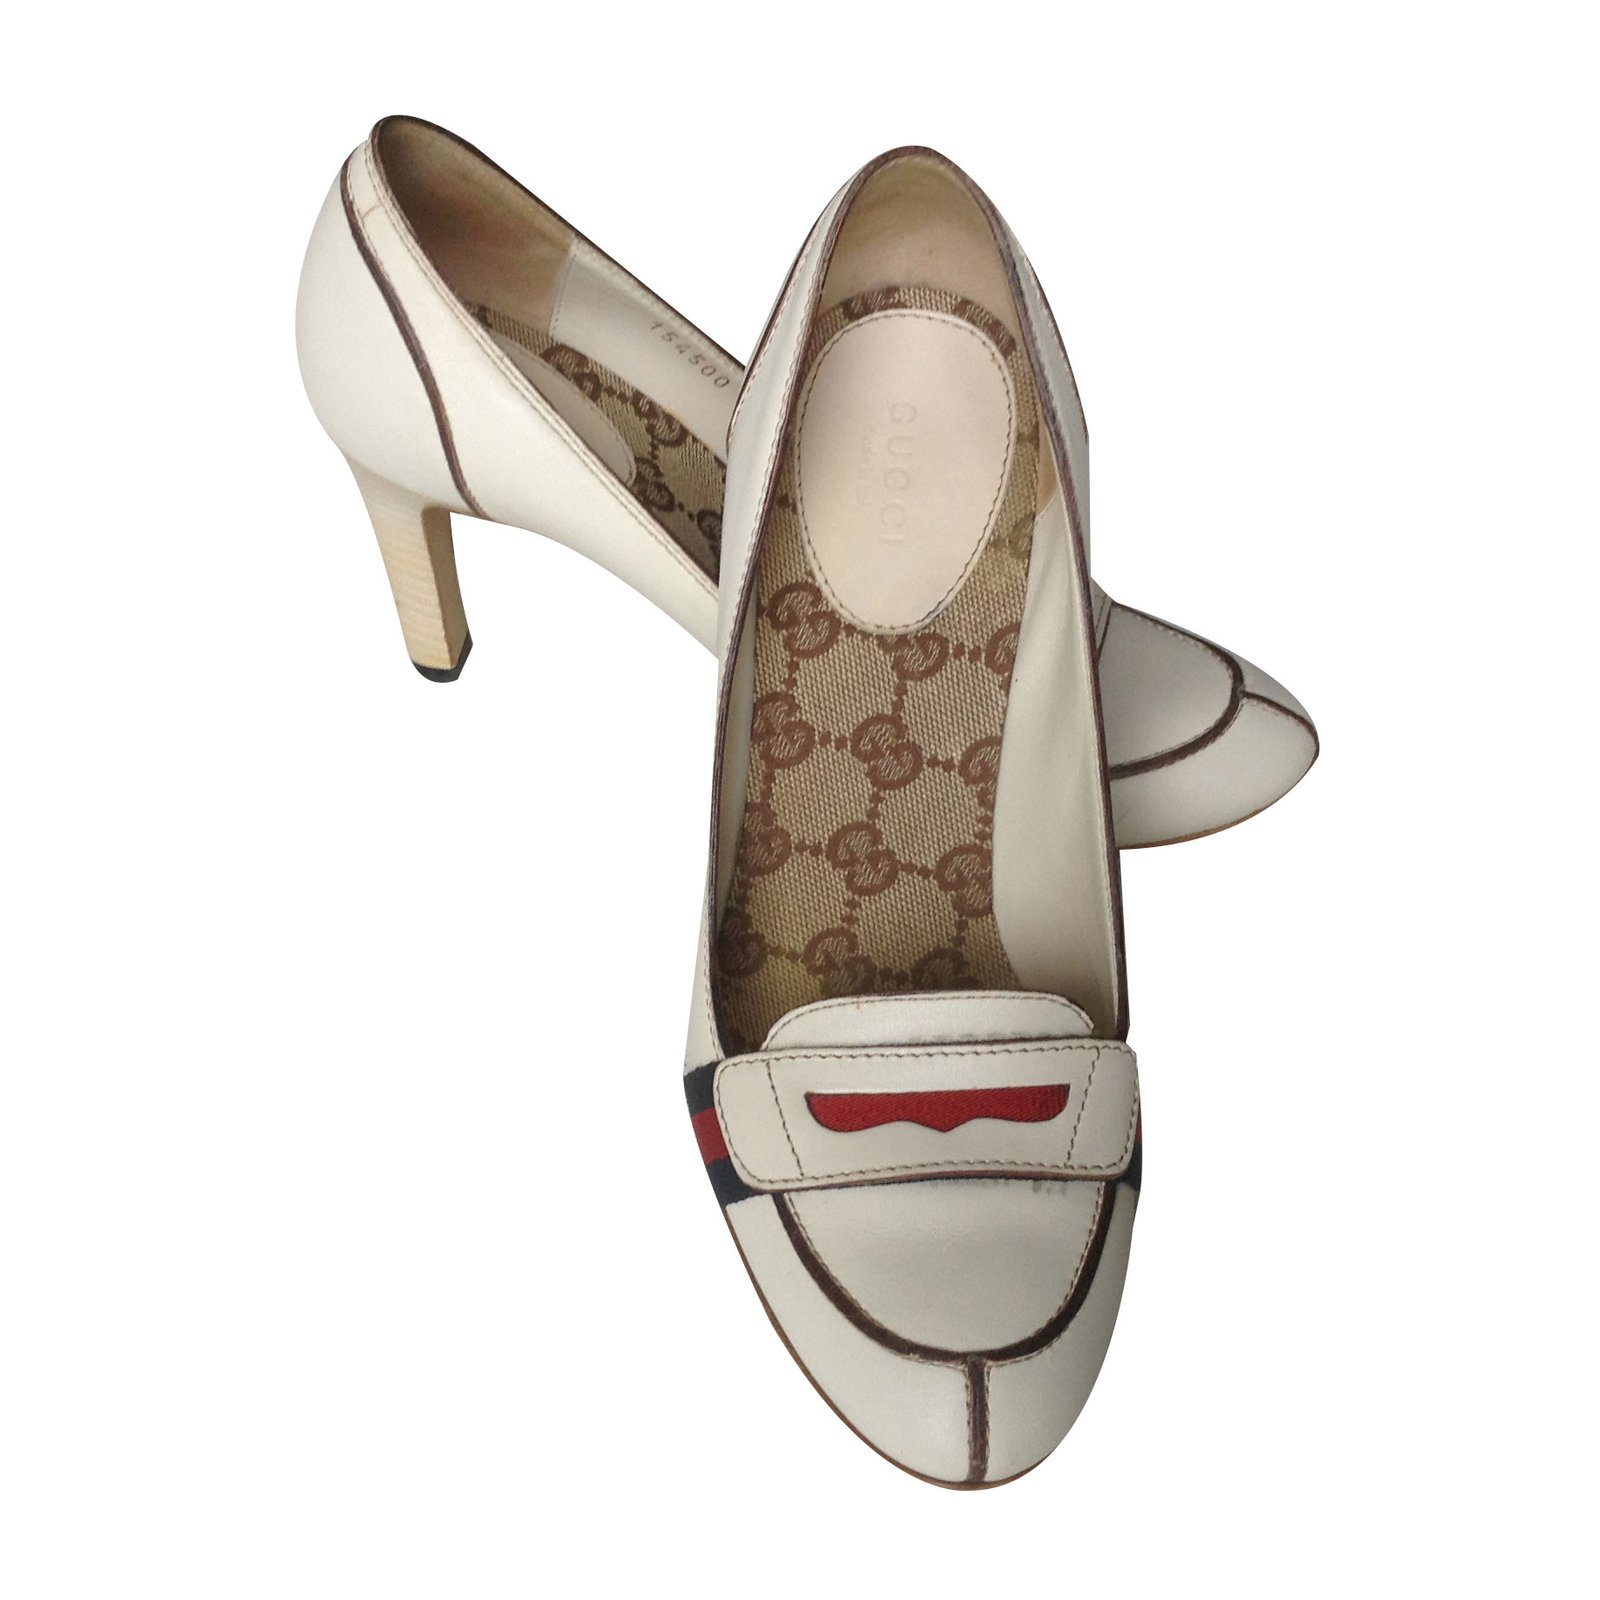 7e1ee131c00 Gucci Loafers Heels Leather Beige ref.70261 - Joli Closet